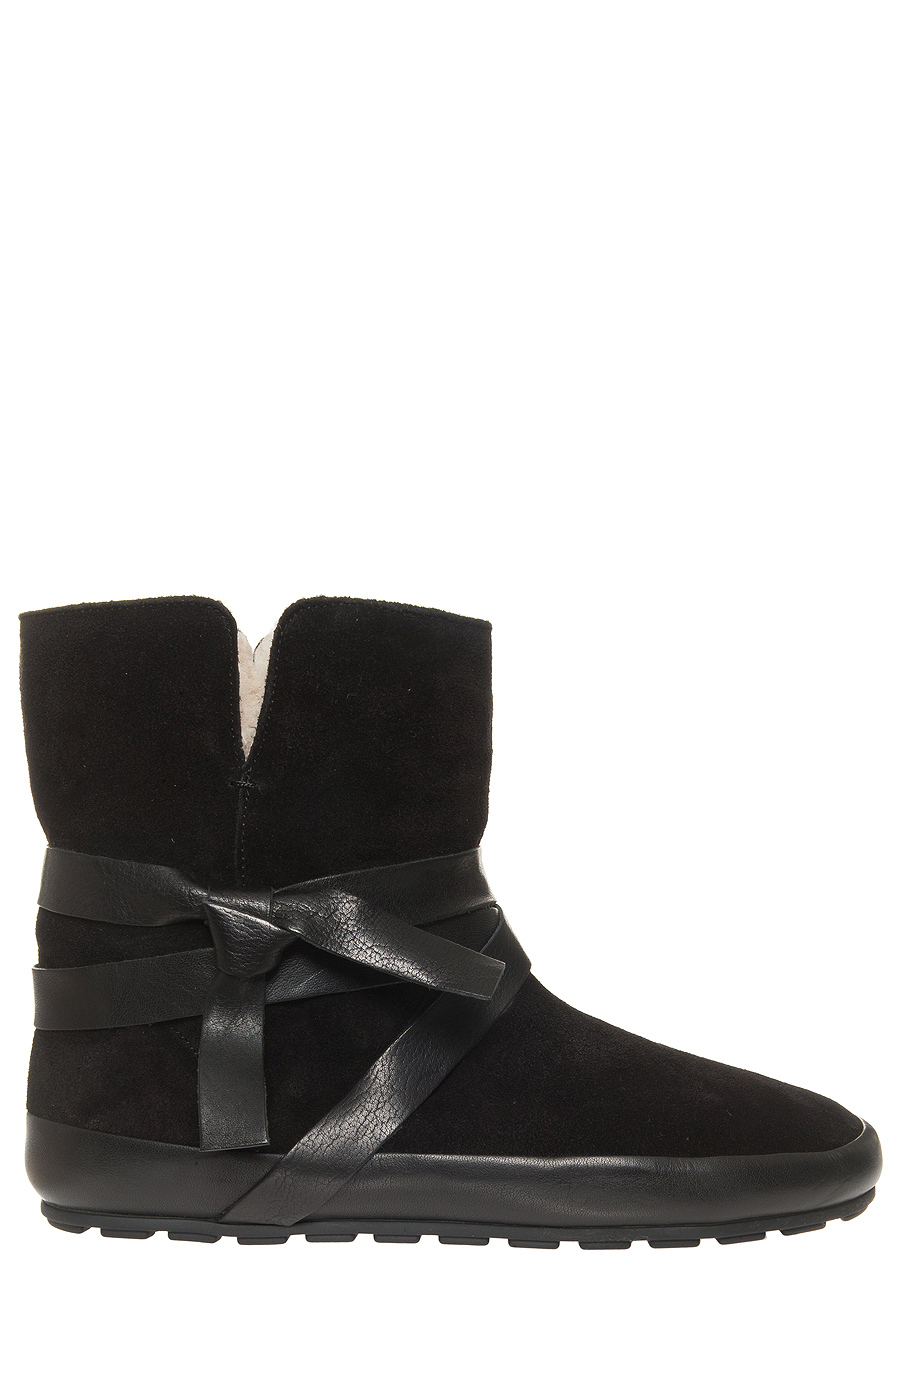 toile isabel marant nigel shearling boots in black lyst. Black Bedroom Furniture Sets. Home Design Ideas